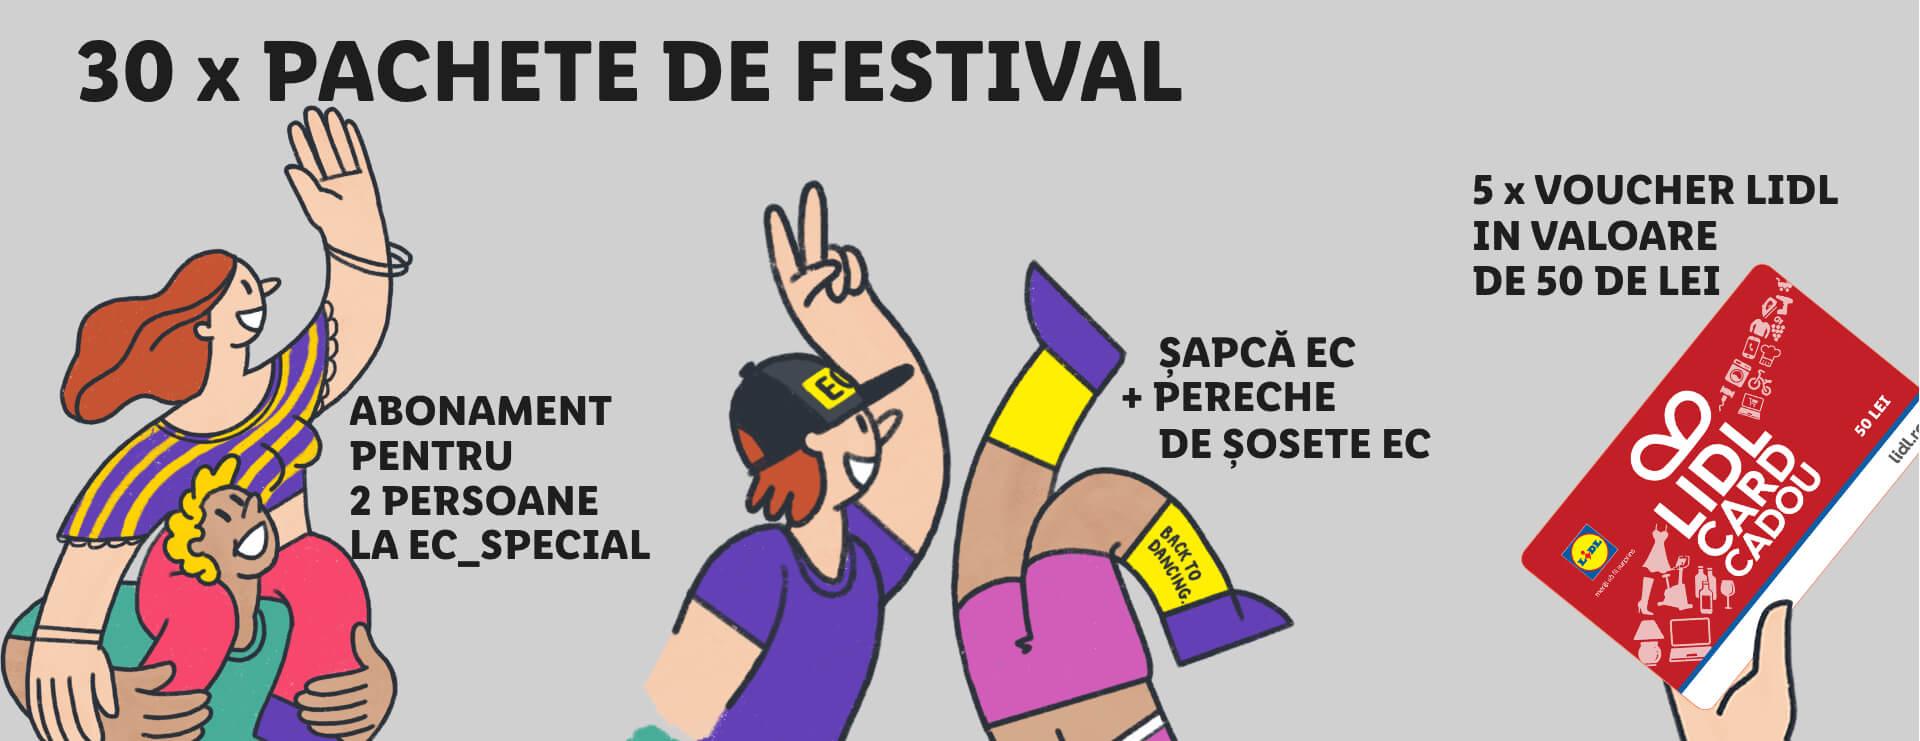 LIDL Romania viata festival